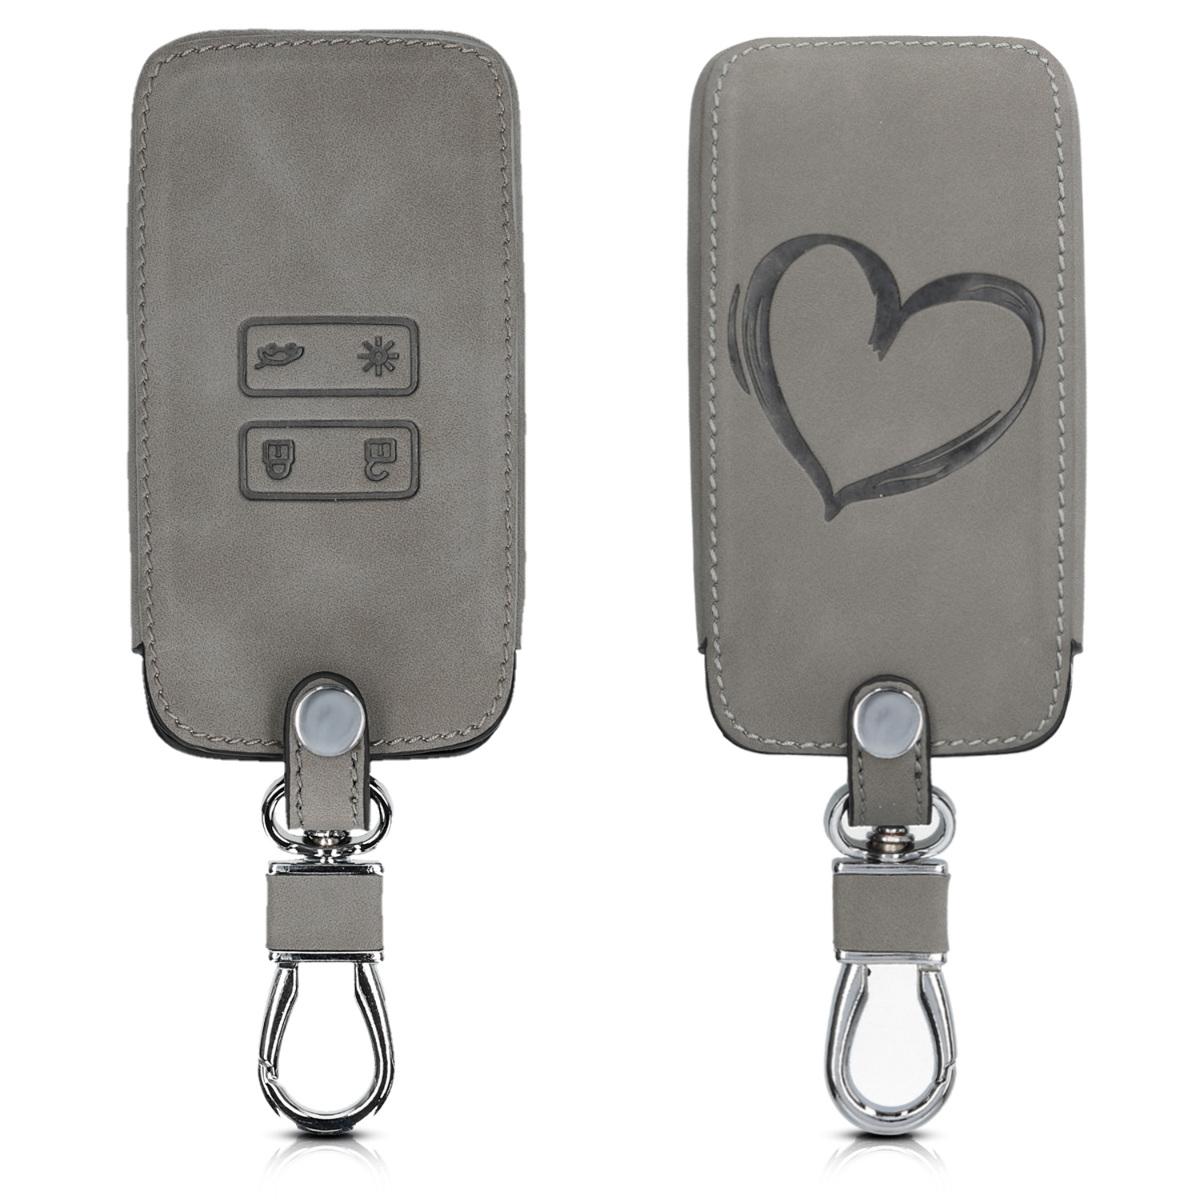 KW Θήκη Κλειδιού Renault - Συνθετικό Δέρμα - 4 Κουμπιά - Grey (48565.06)